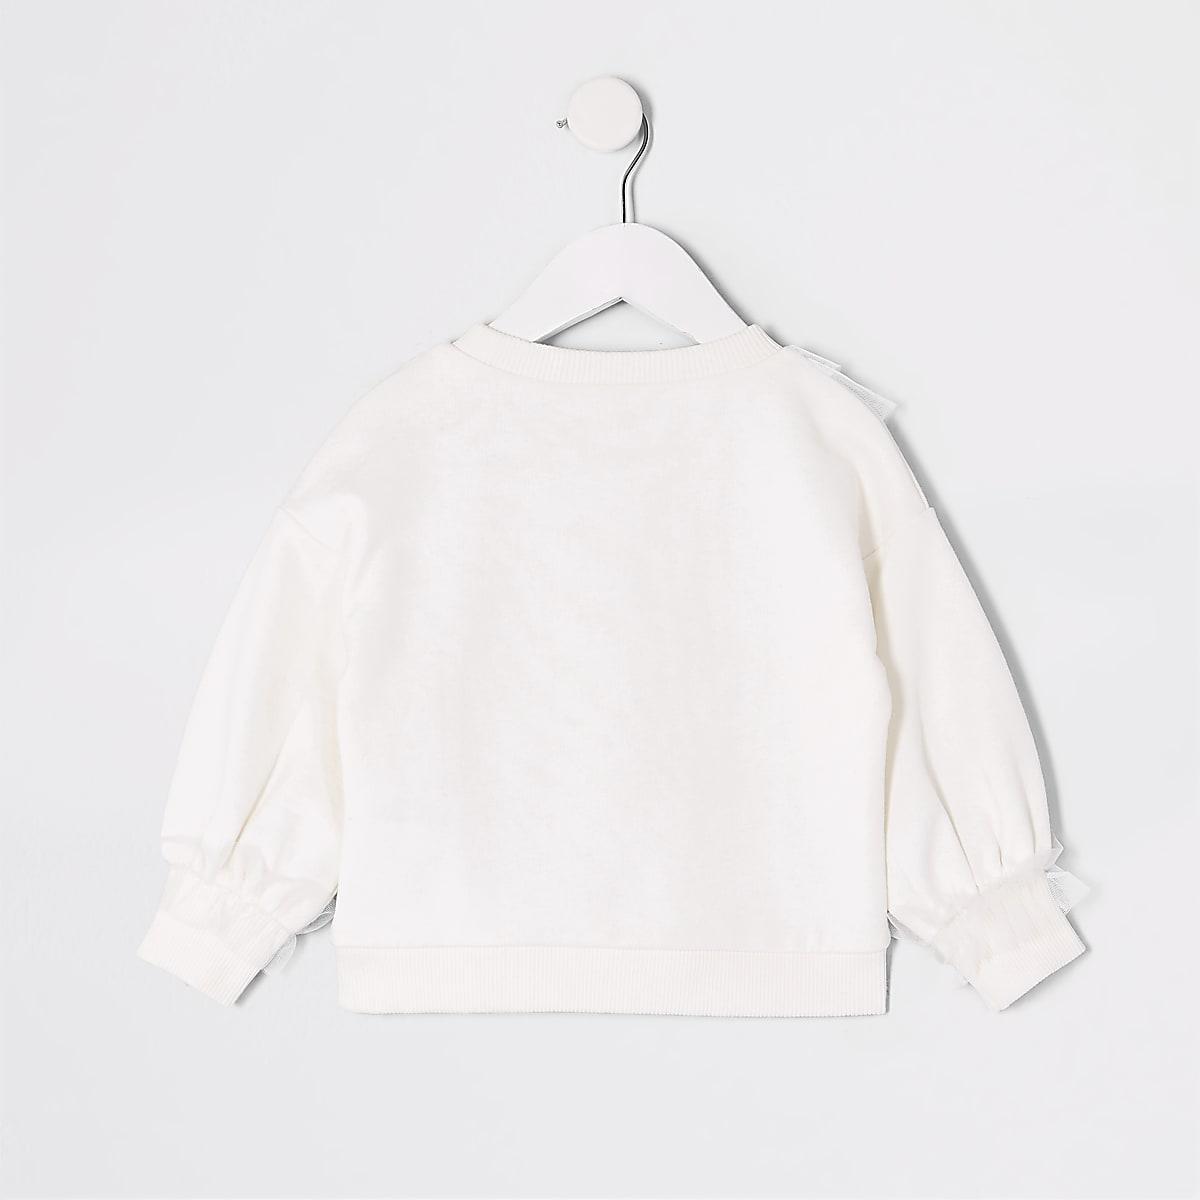 087a4cddd4 Mini girls white bow mesh trim sweatshirt - Baby Girls Tops - Mini ...